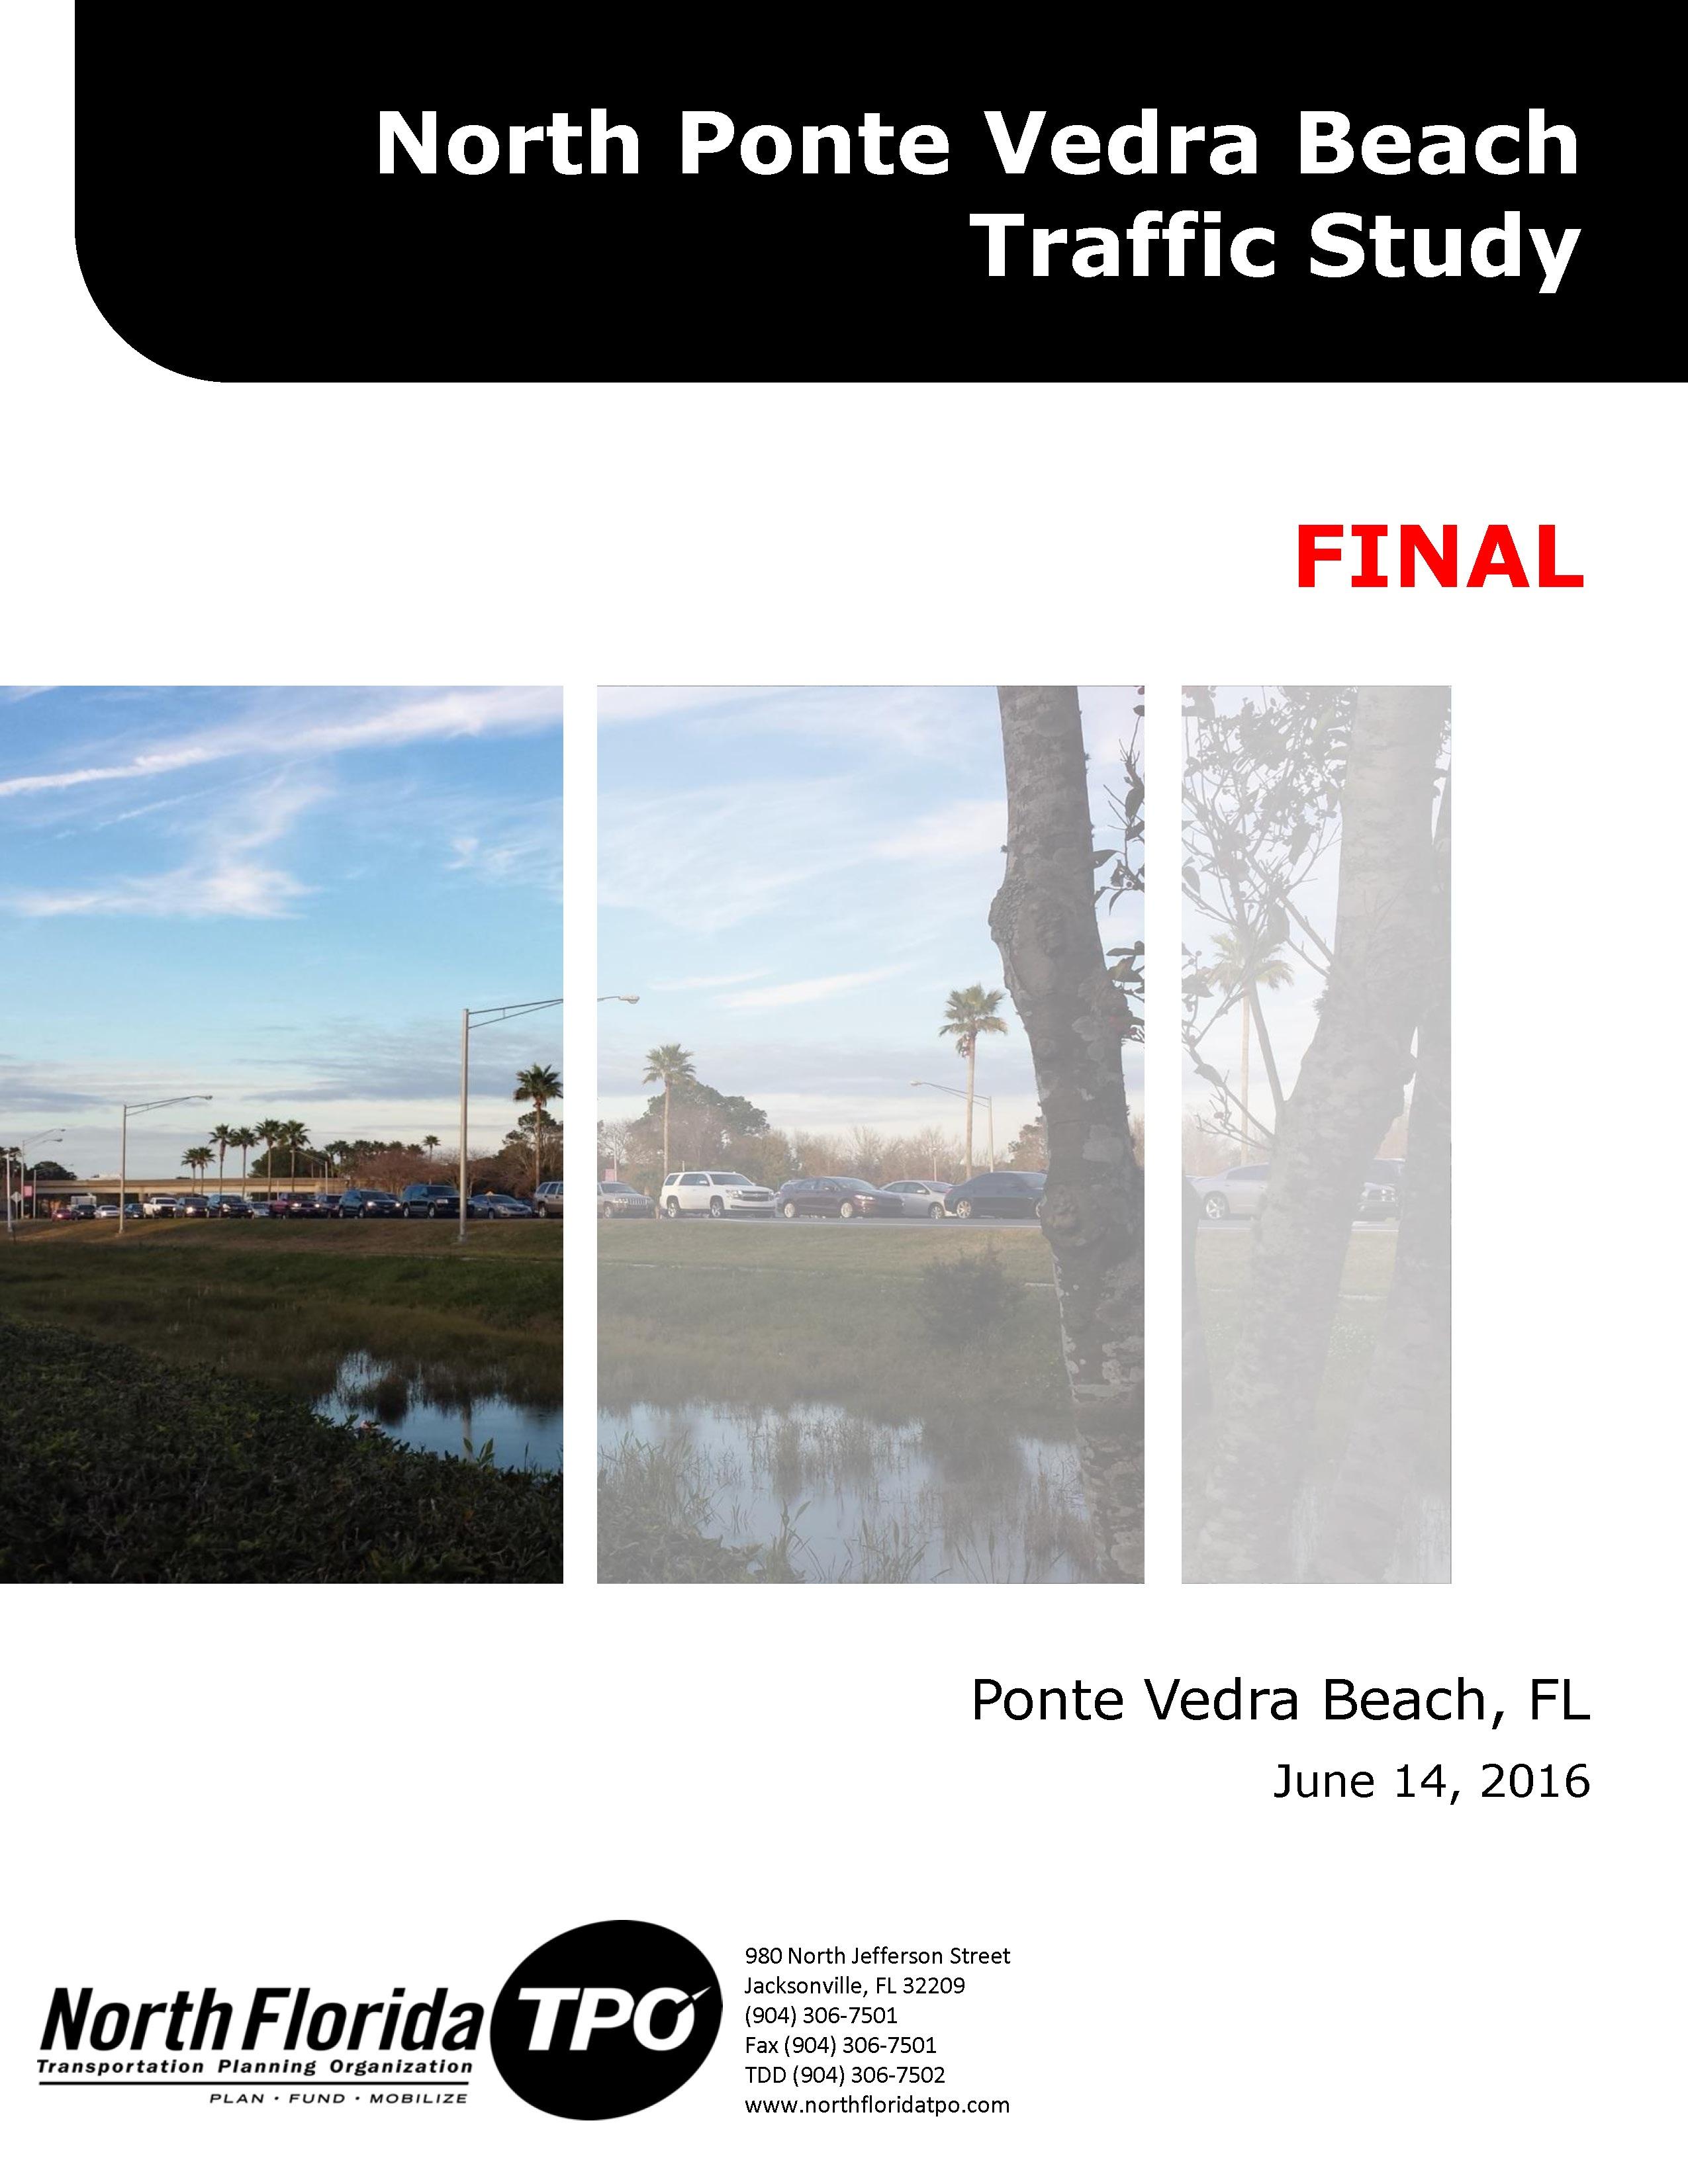 North Ponte Vedra Beach Traffic Study Final 6 14 16 cover